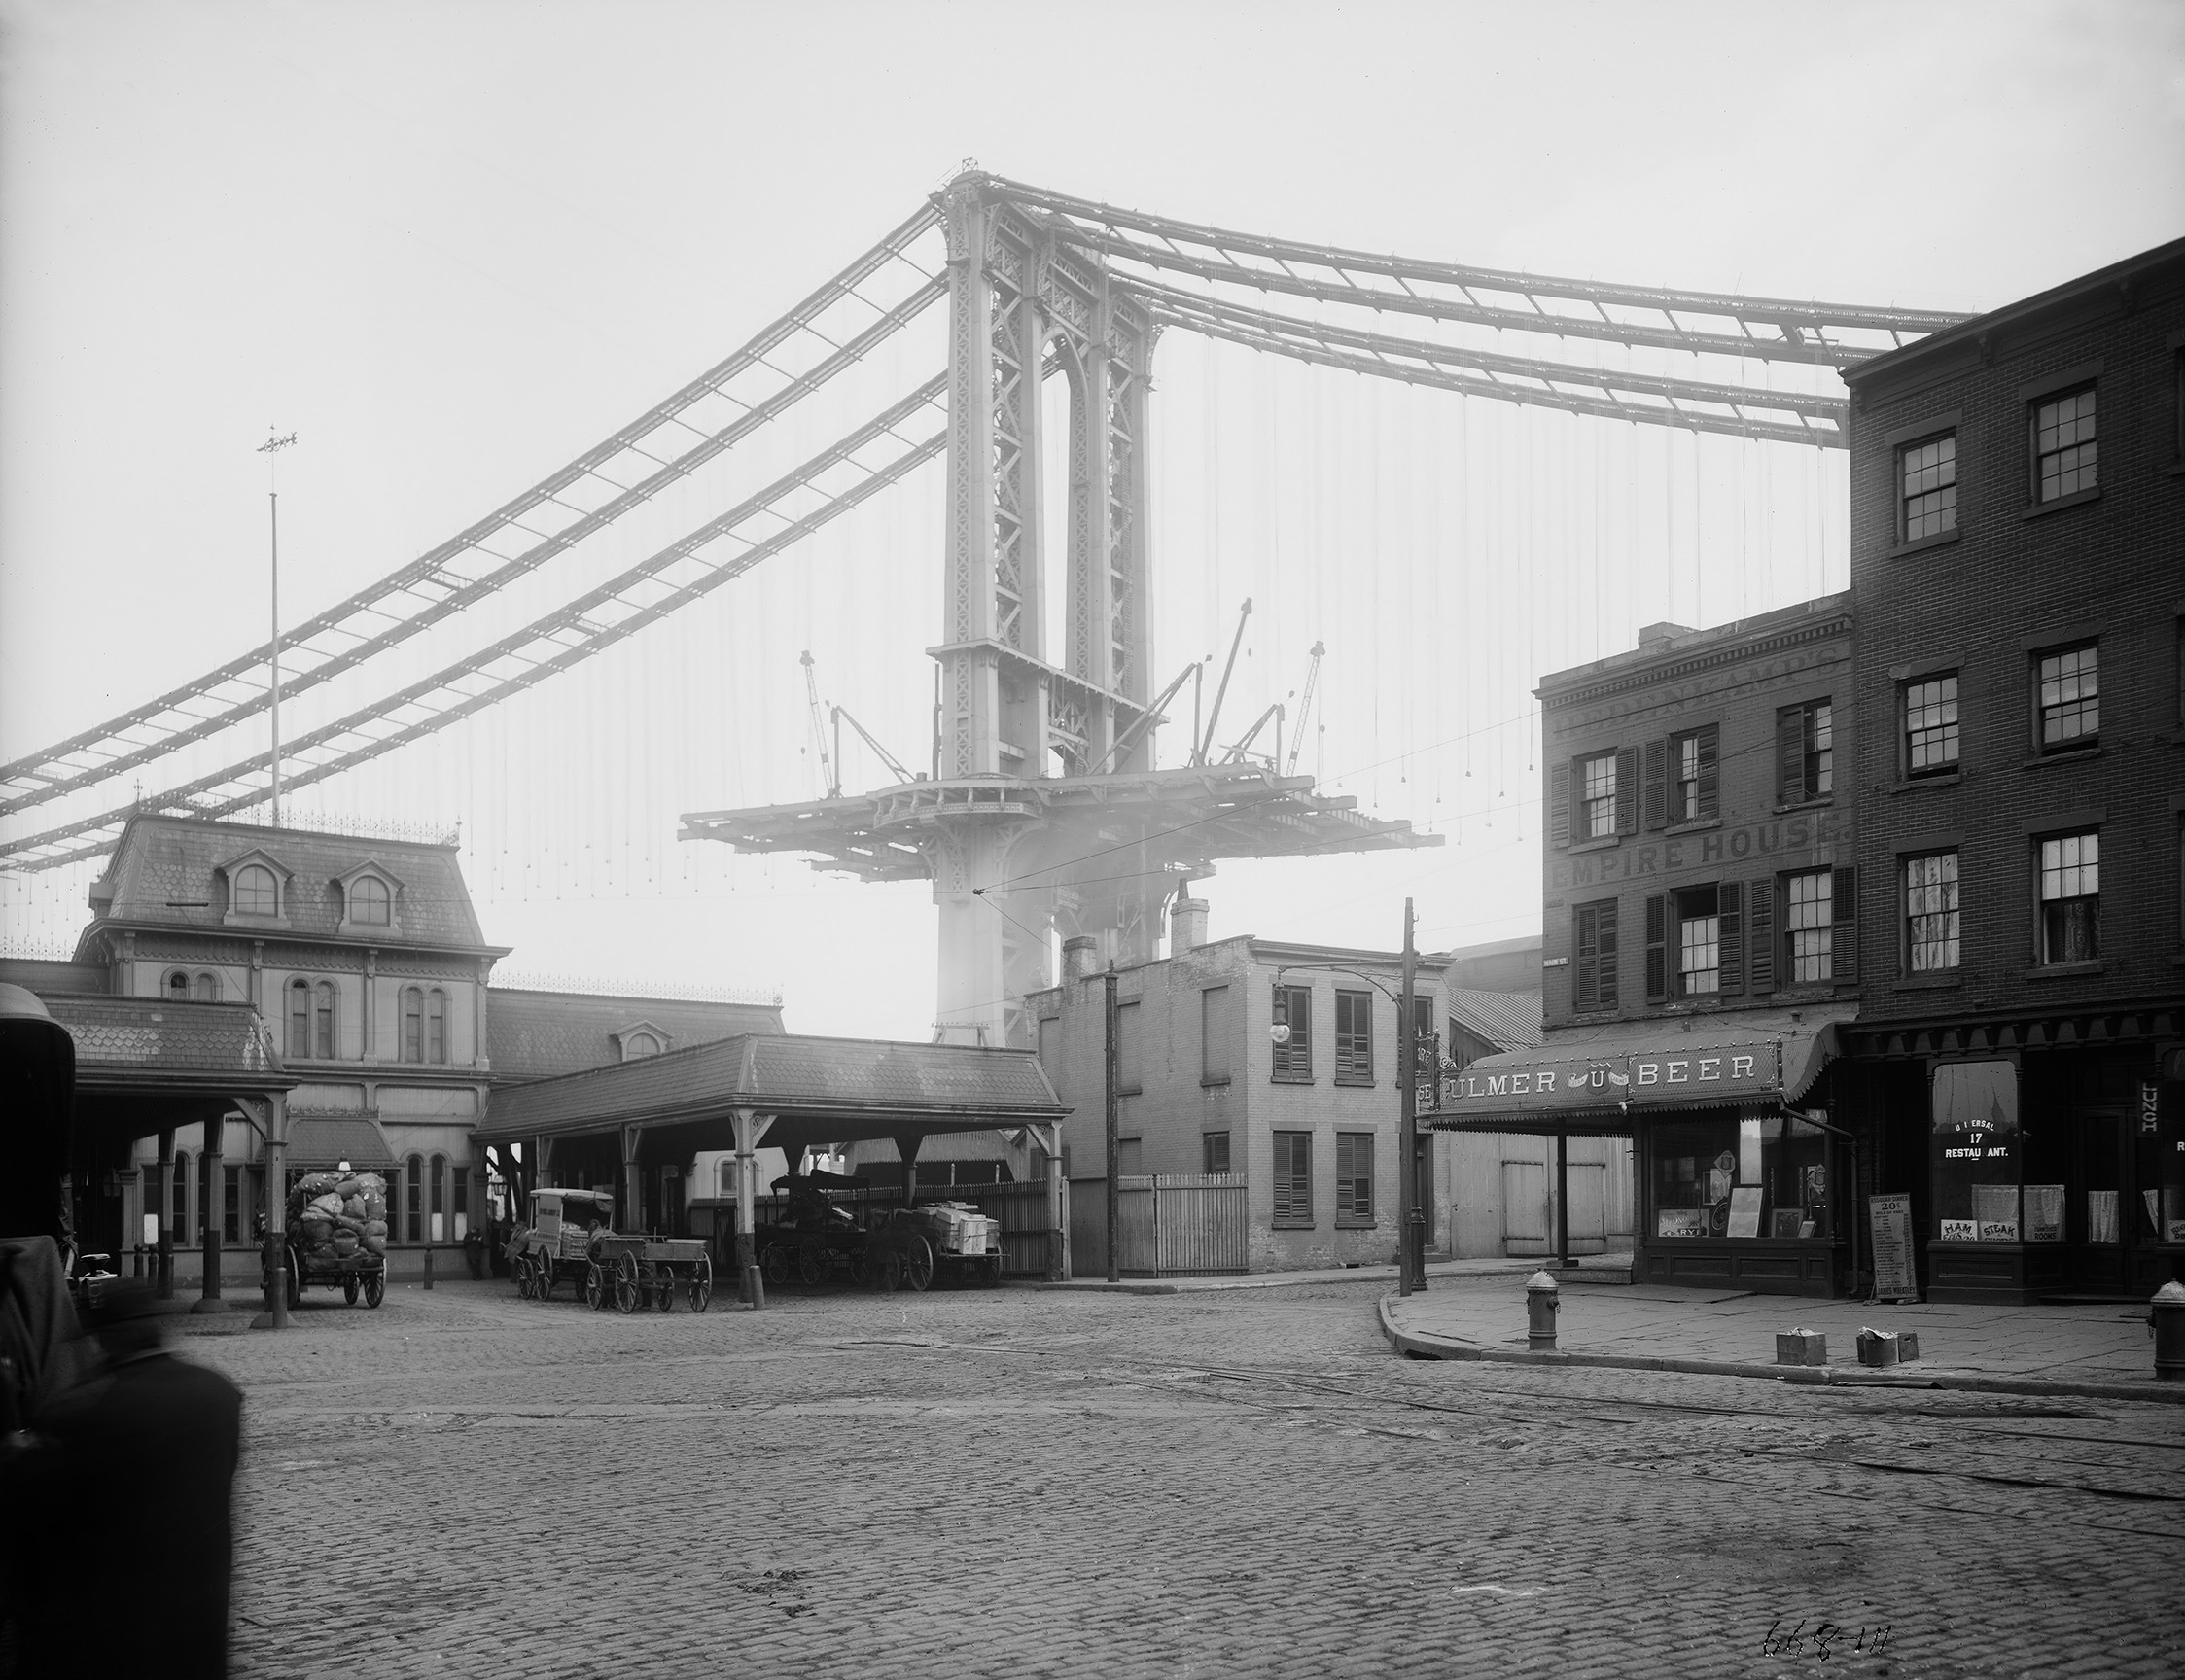 Manhattan Bridge, tower superstructure from Main Street, Brooklyn, Eugene de Salignac, March 11, 1909